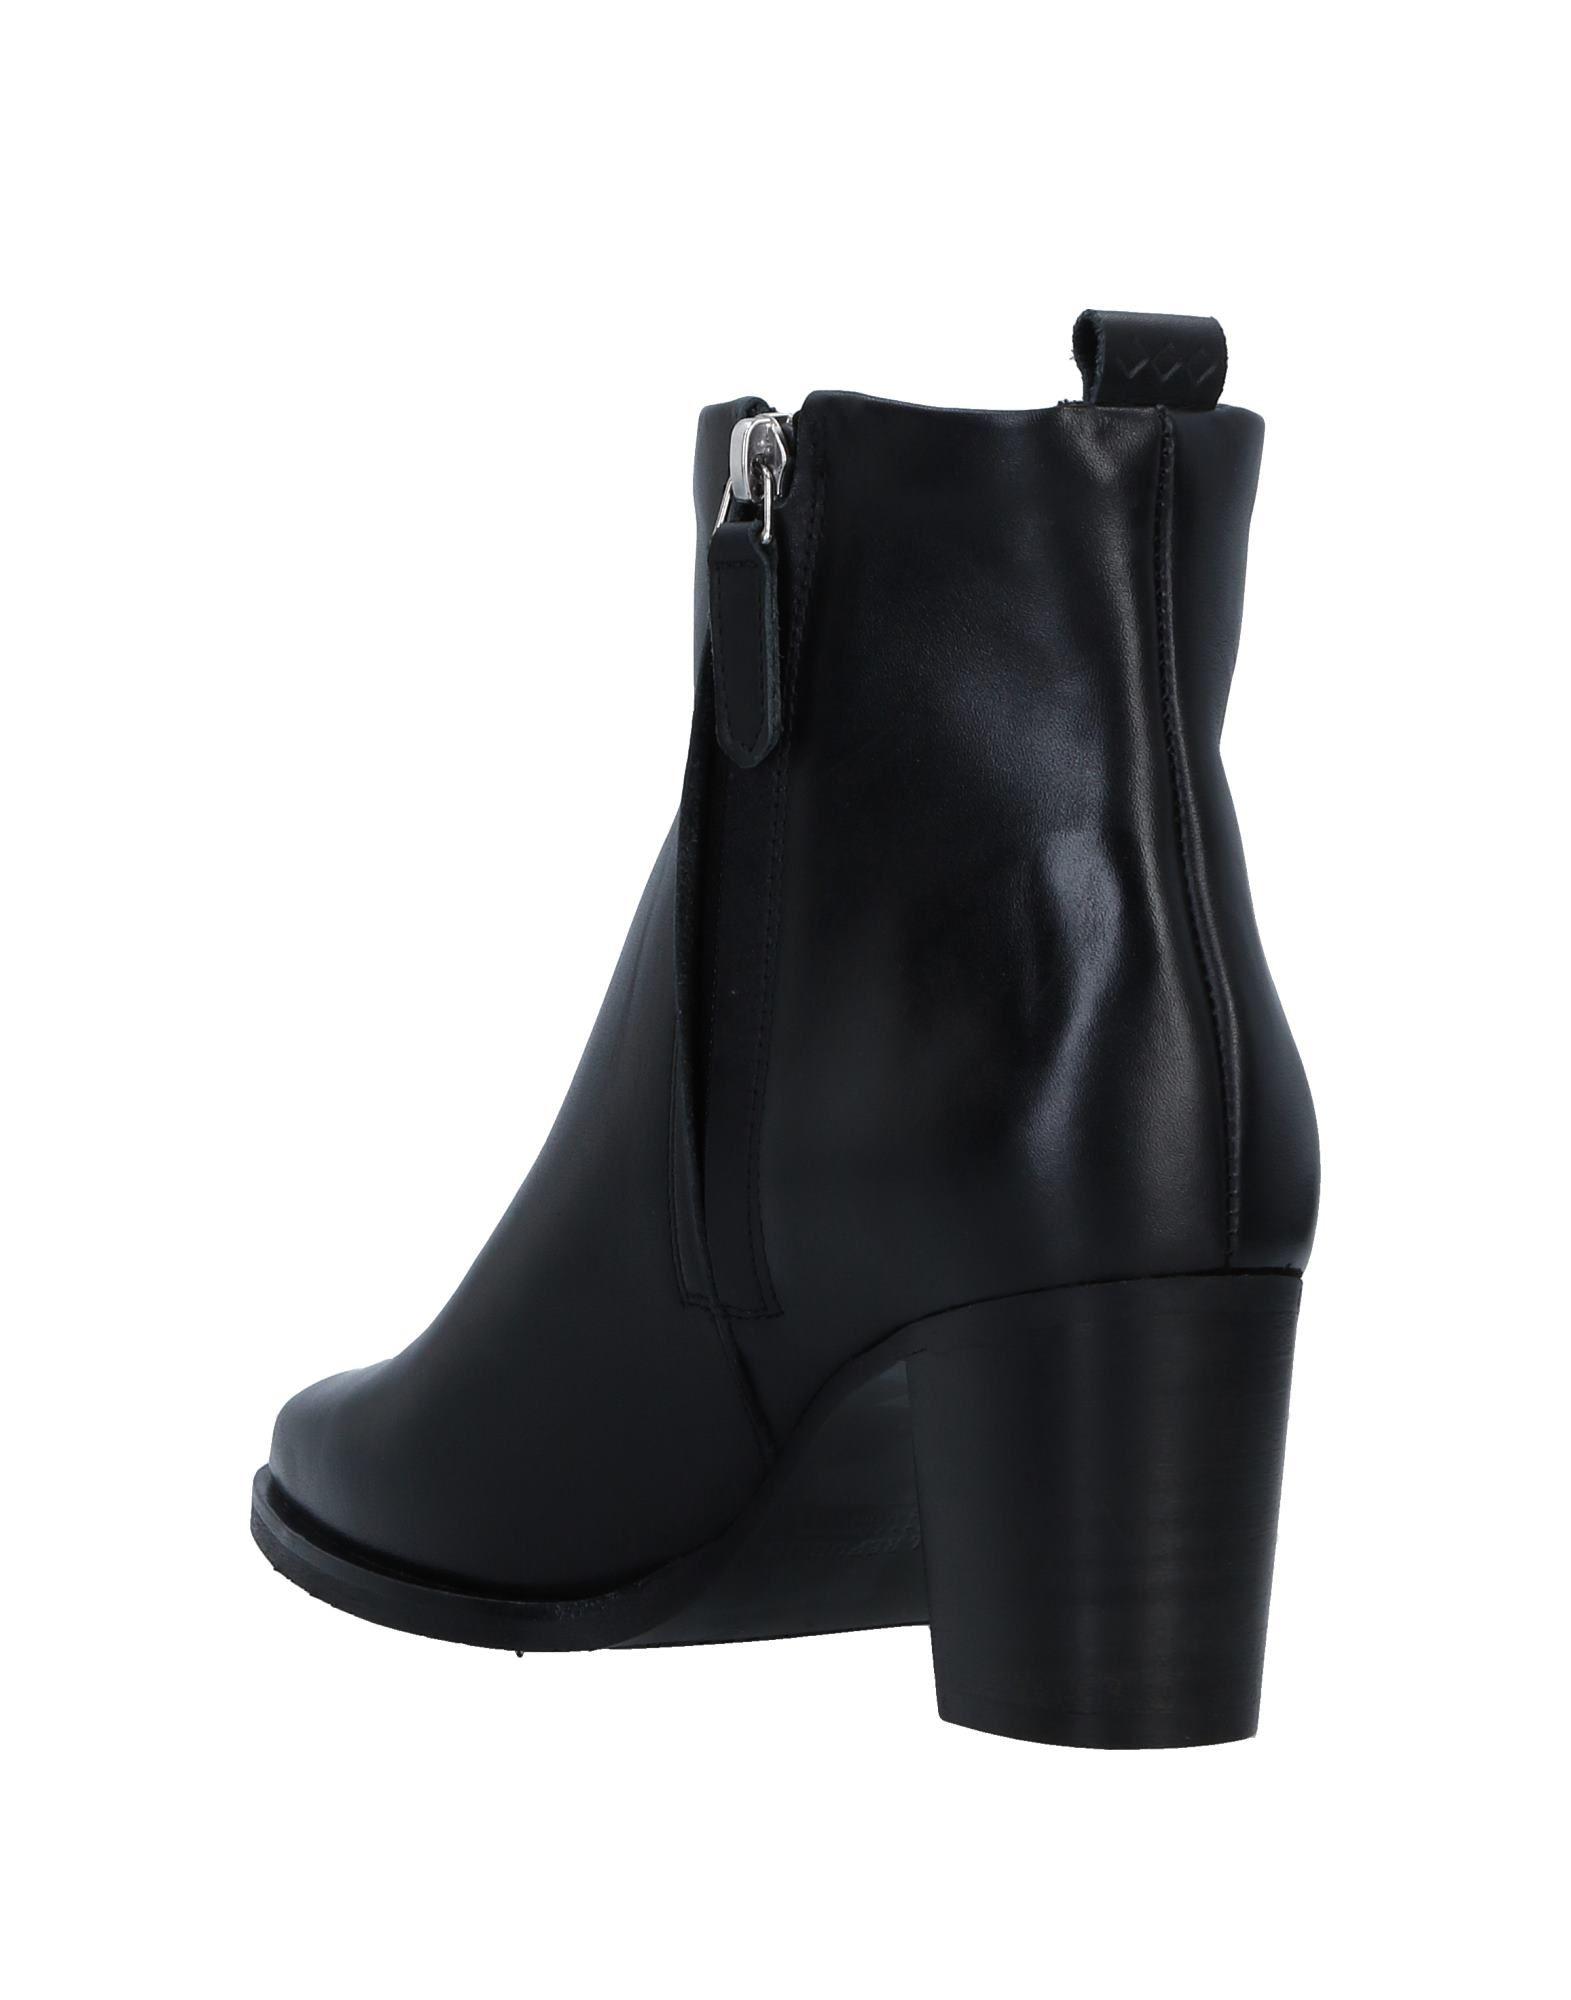 Rabatt Schuhe Royal 11543395OP Republiq Stiefelette Damen  11543395OP Royal be960f